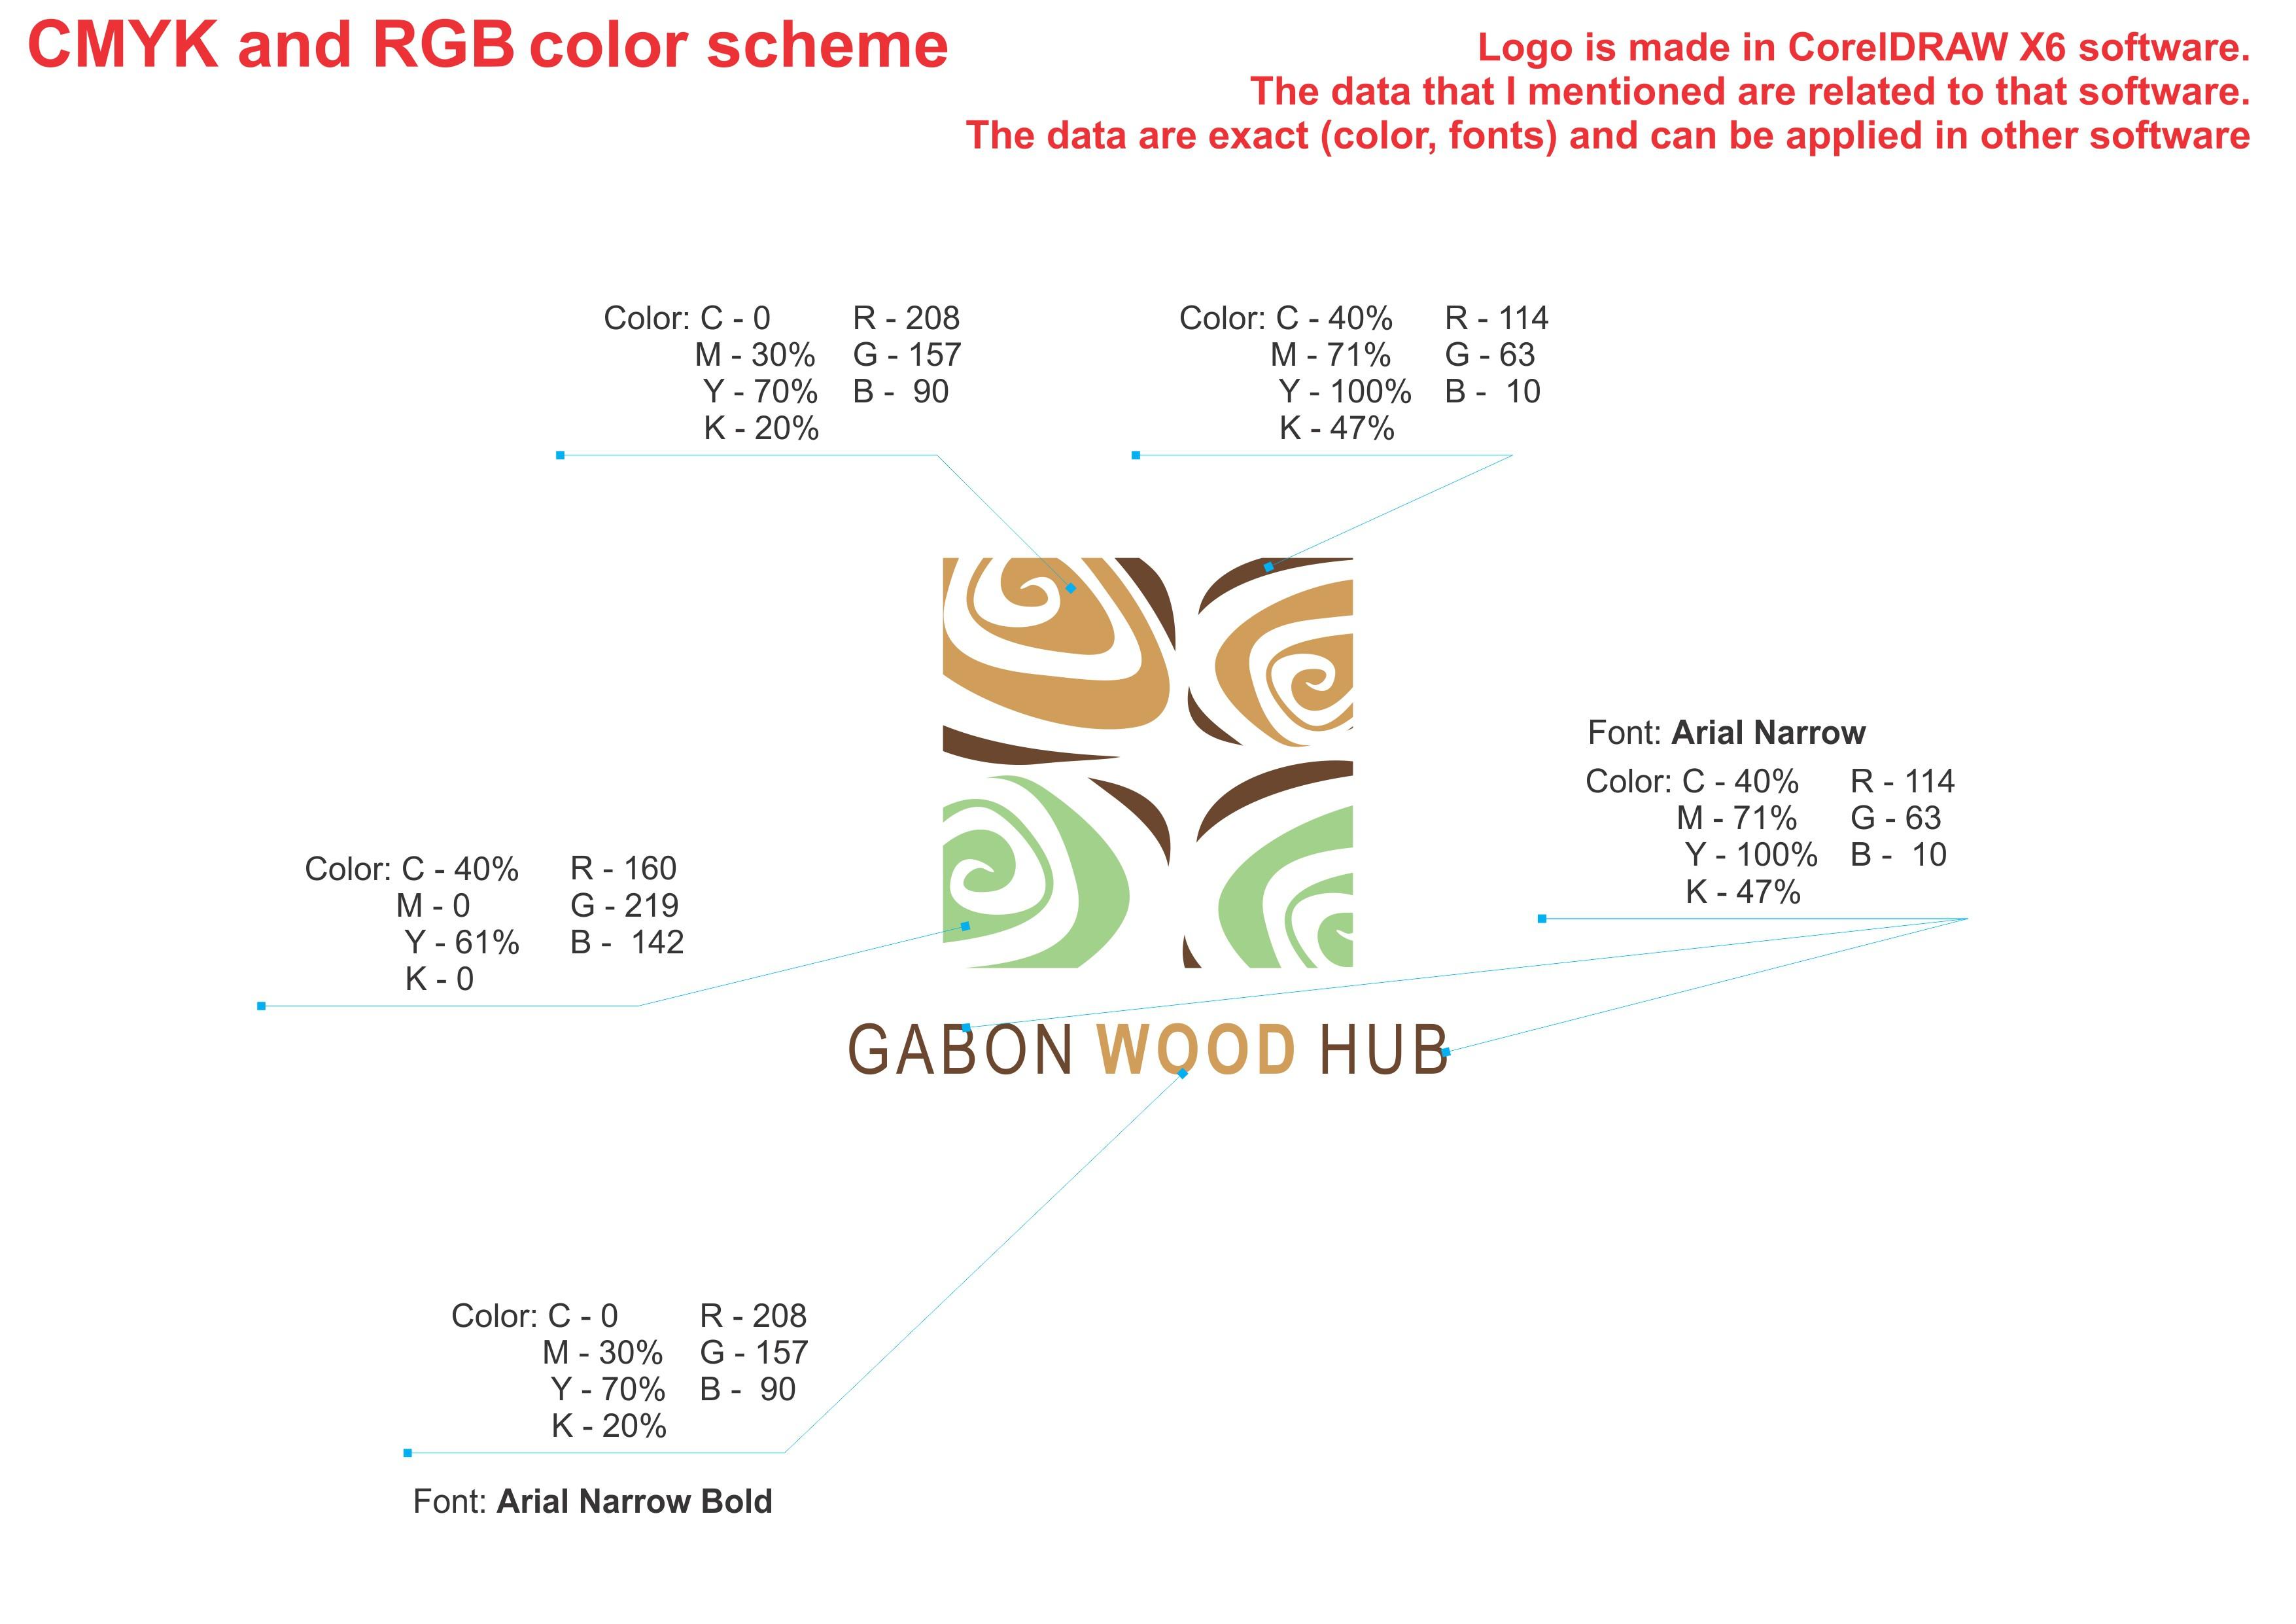 LOGO FOR GABON WOOD HUB (luxury design wooden objects)